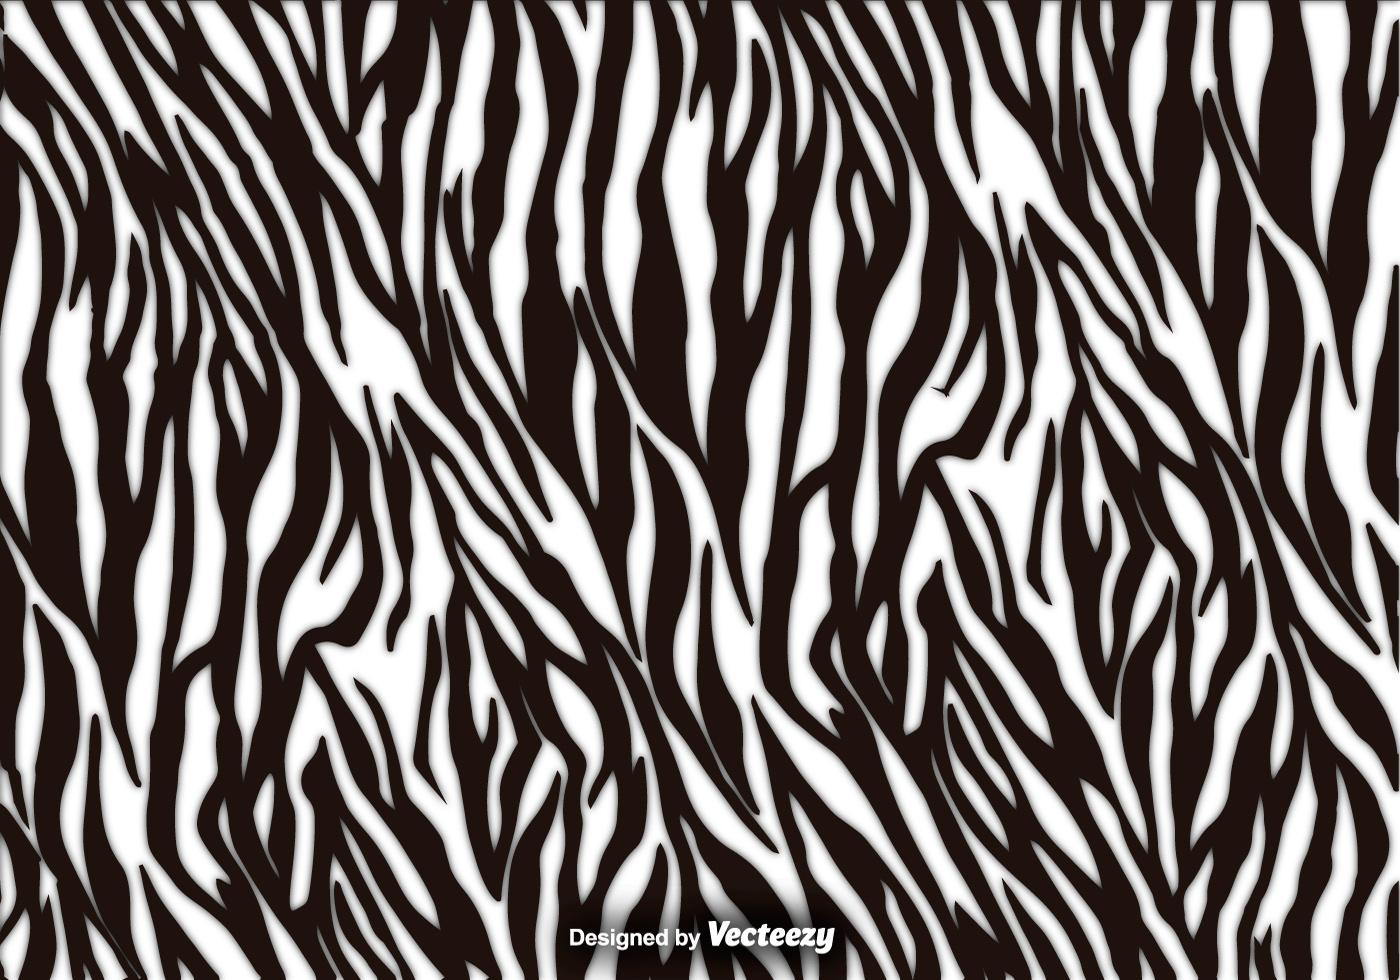 Leopard Animal Print Wallpaper Zebra Stripes Vector Texture Background Download Free